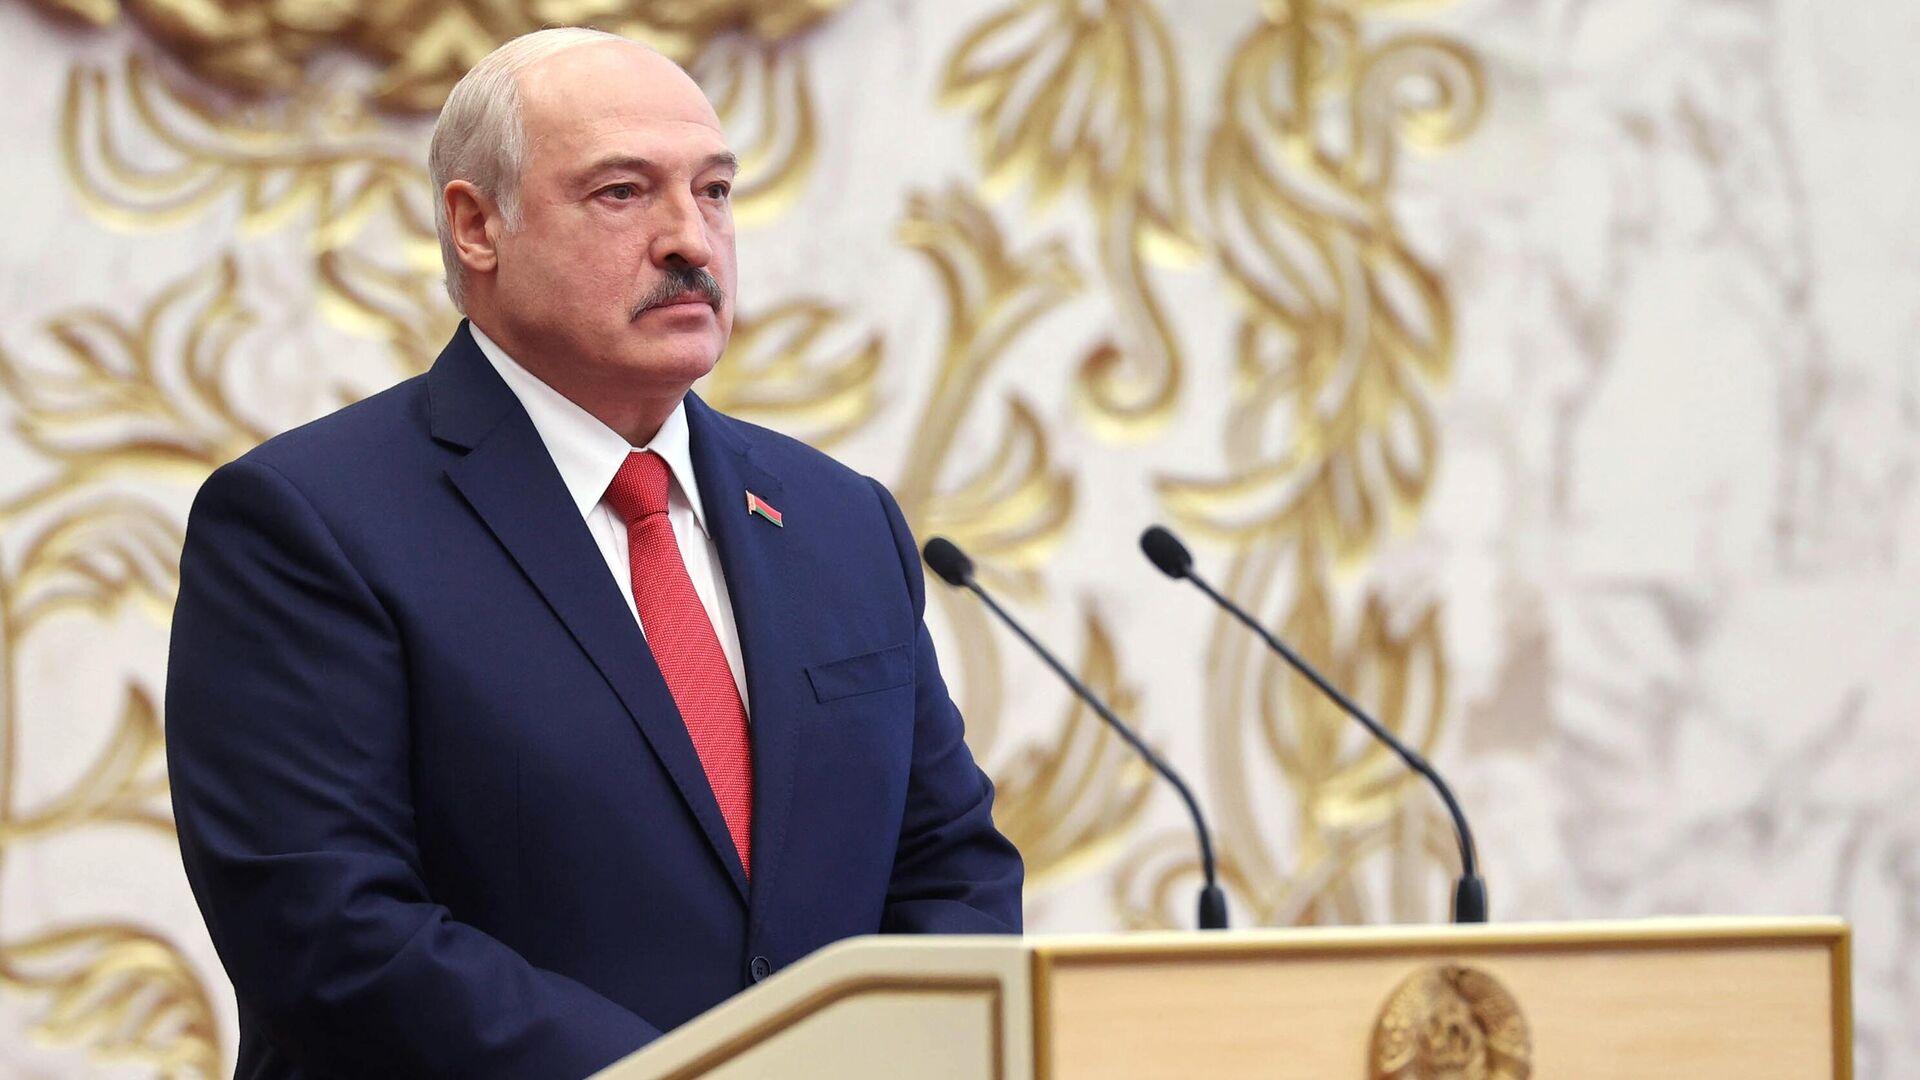 Президент Белоруссии Александр Лукашенко на церемонии инаугурации в Минске - РИА Новости, 1920, 24.09.2020